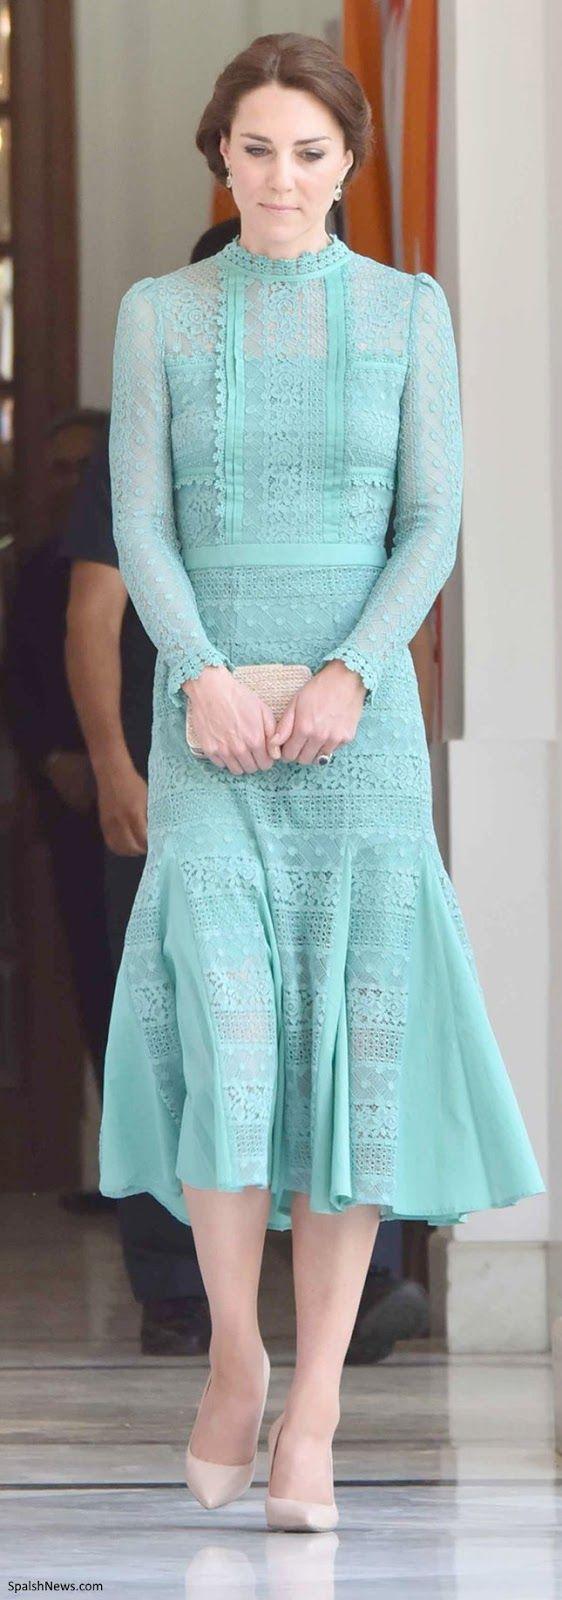 Duchess Kate: Elegant Kate in Jade Temperley London for Lunch with Prime Minister Modi